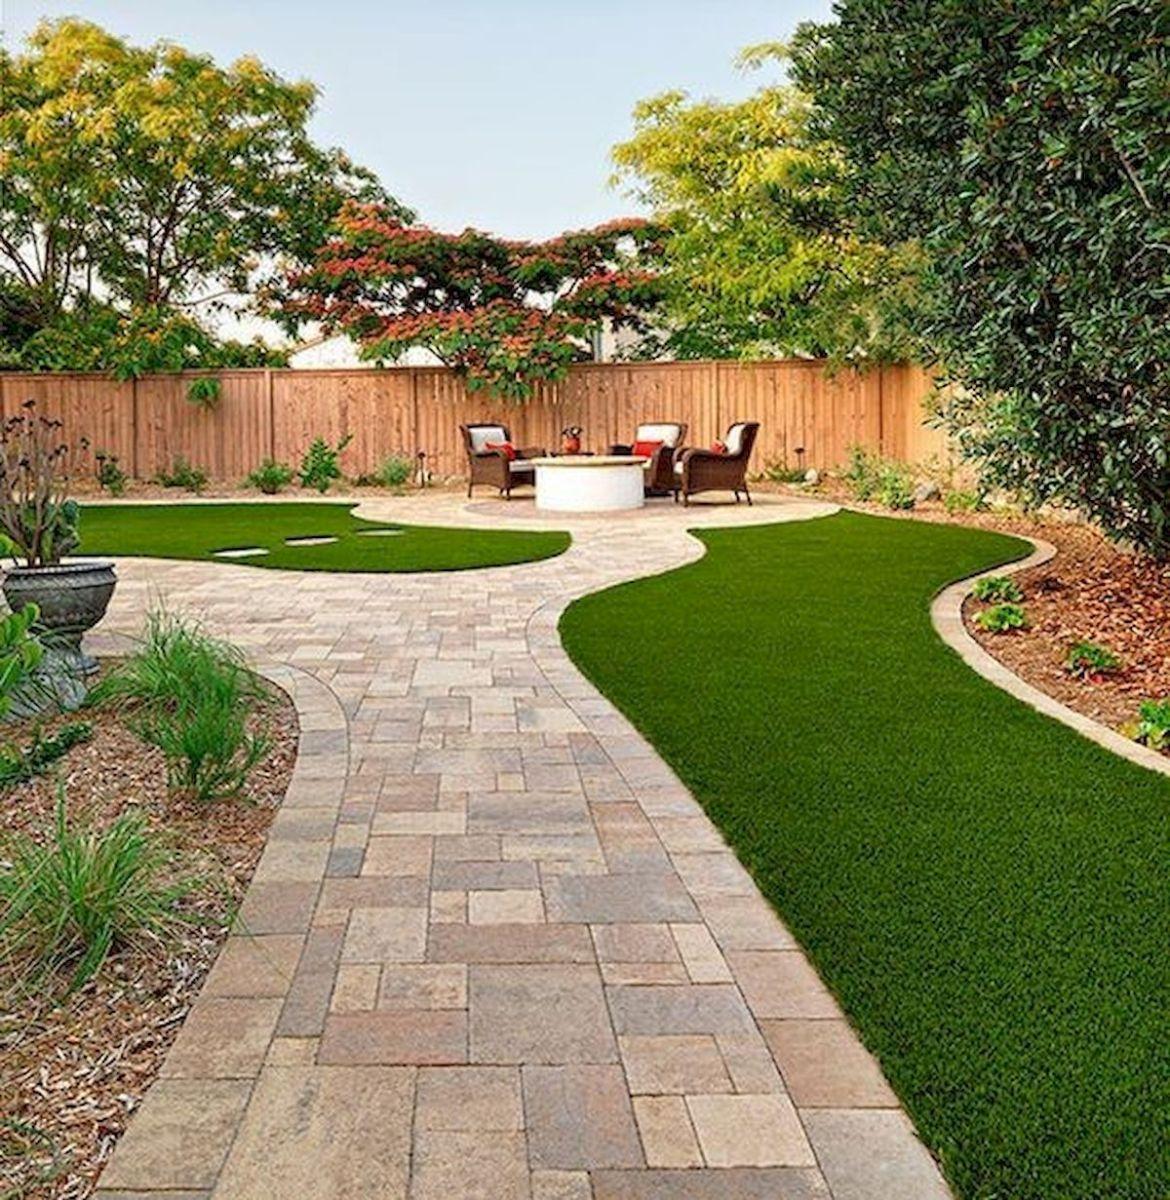 Beautiful Backyards Garden Ideas: 33 Beautiful Backyard Garden Design Ideas (1